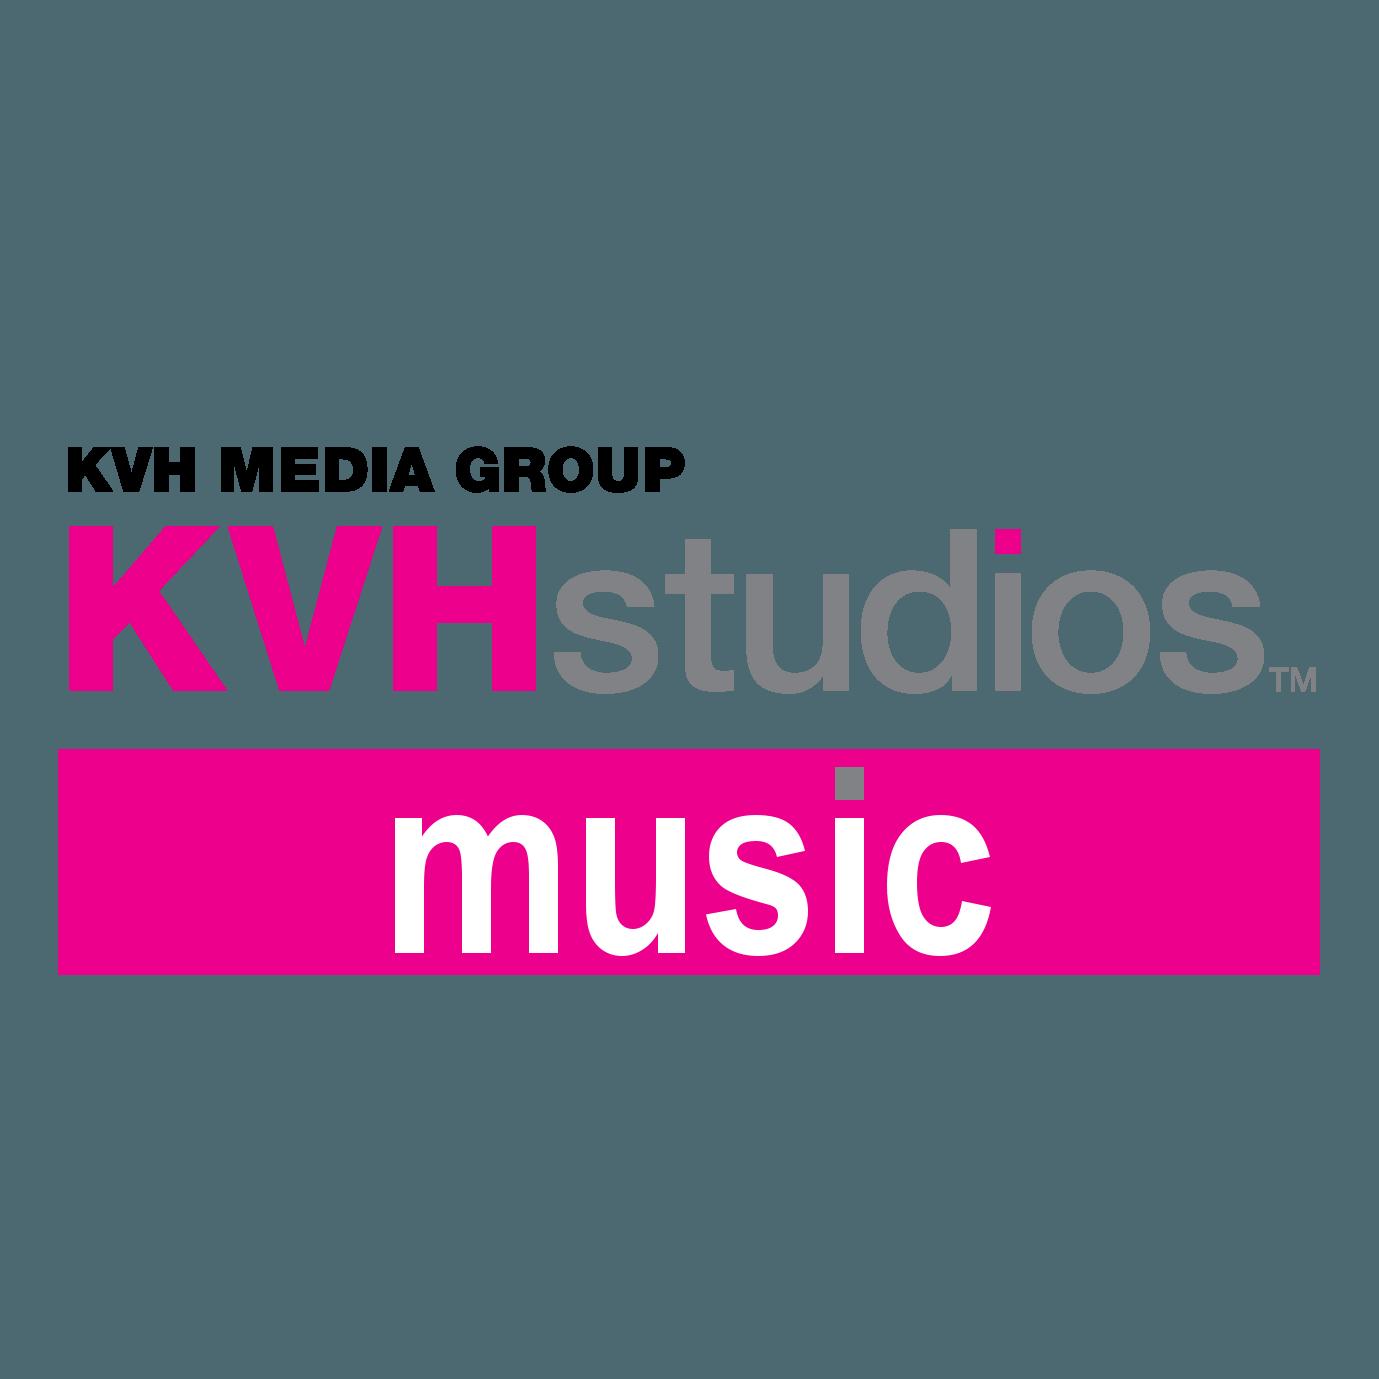 radio advertising ideas by KVH Studios